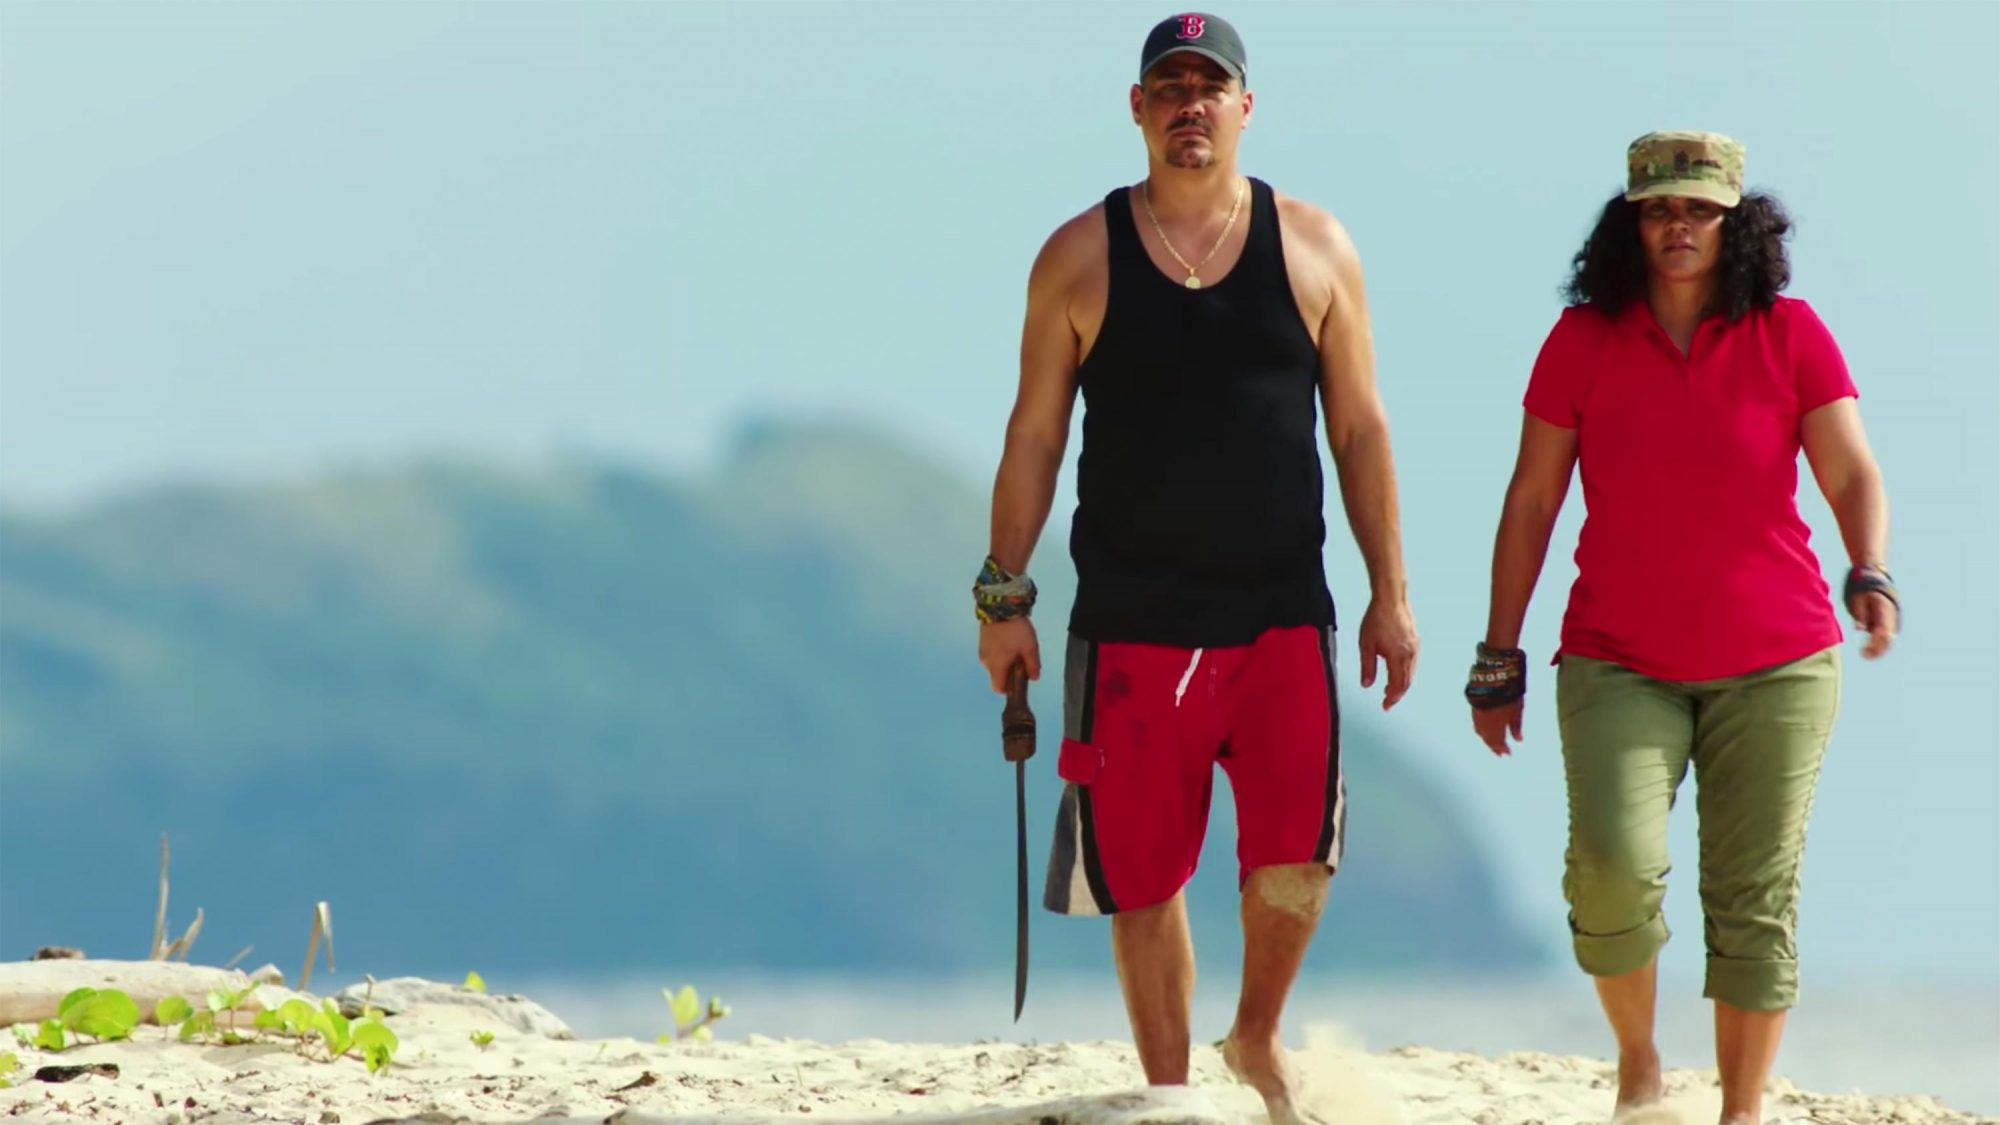 Survivor: Island of the Idols screen grab